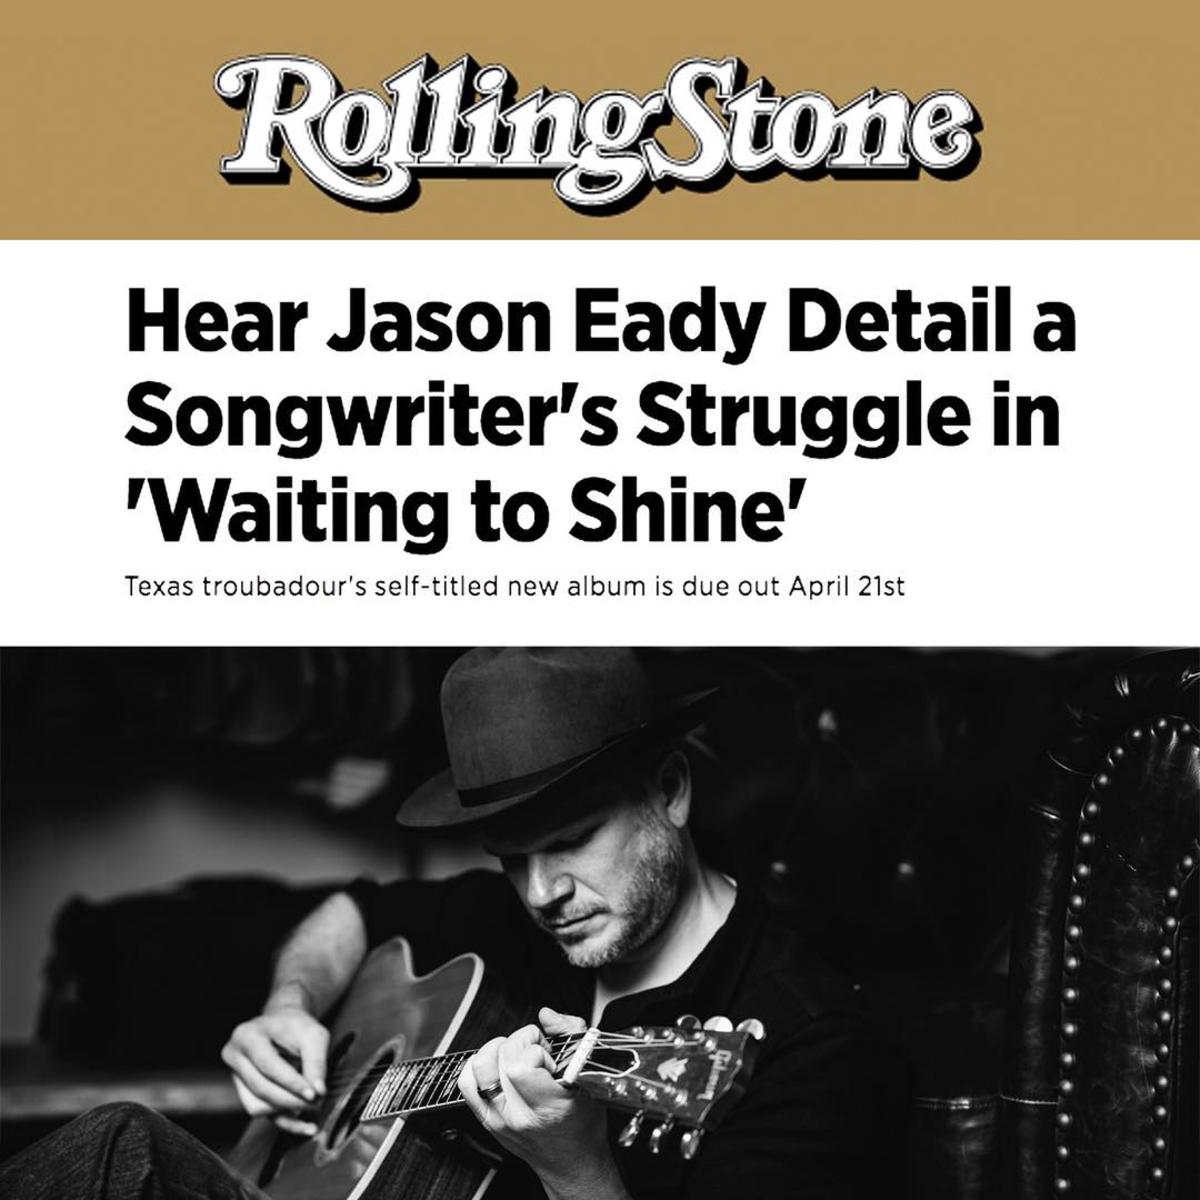 Rolling Stone - Jason Eady